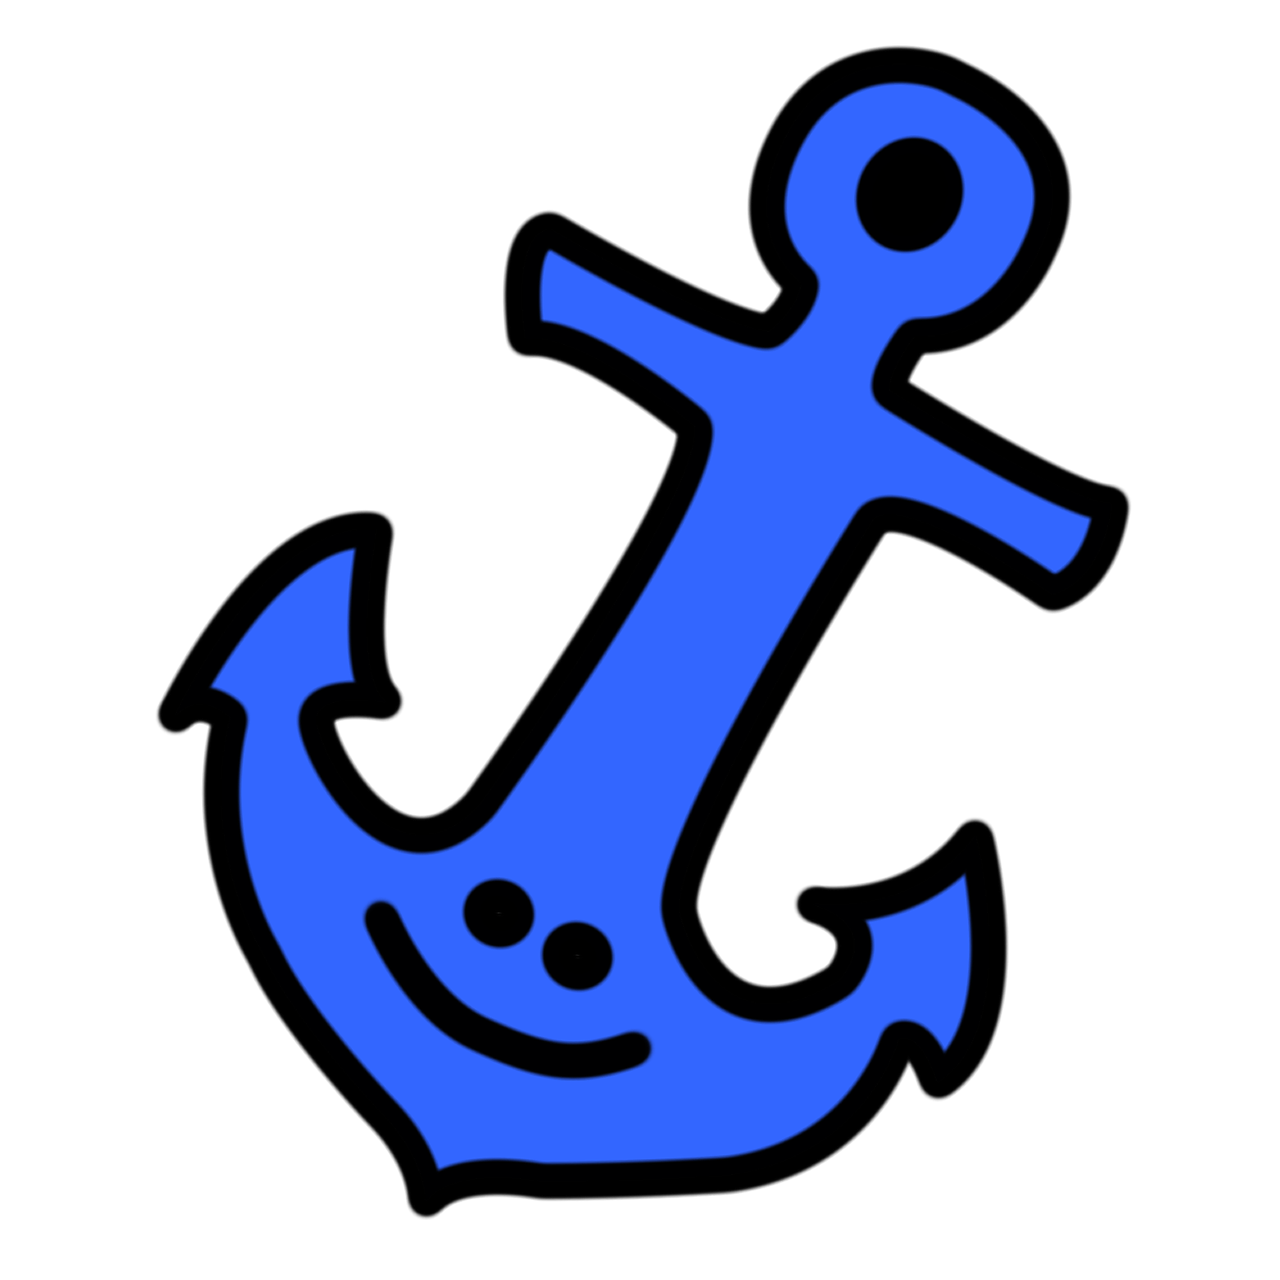 Sea ocean fisherman costa. Anchor clipart boat anchor